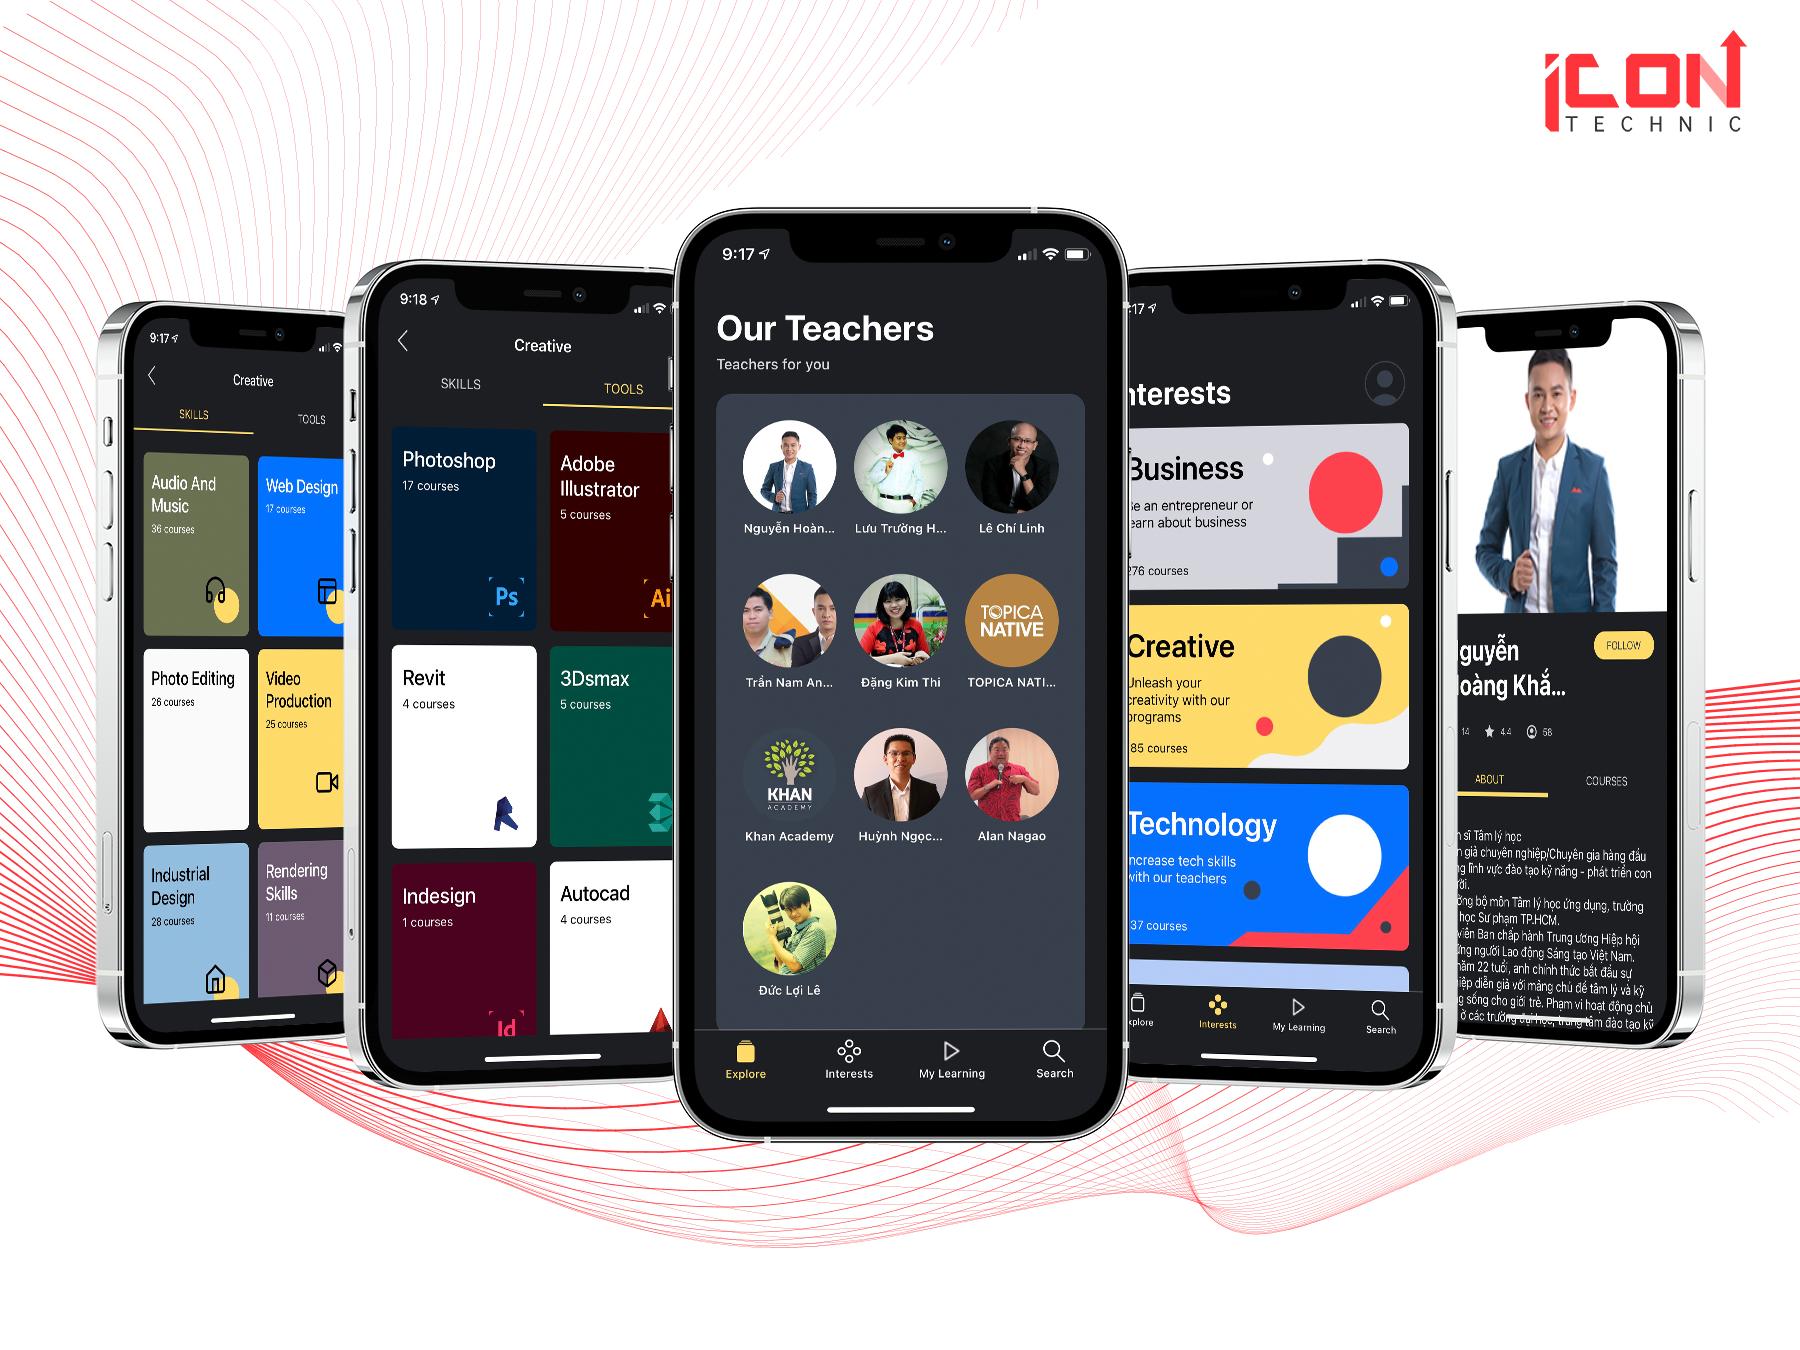 giá viết app cho edumall - icon technic